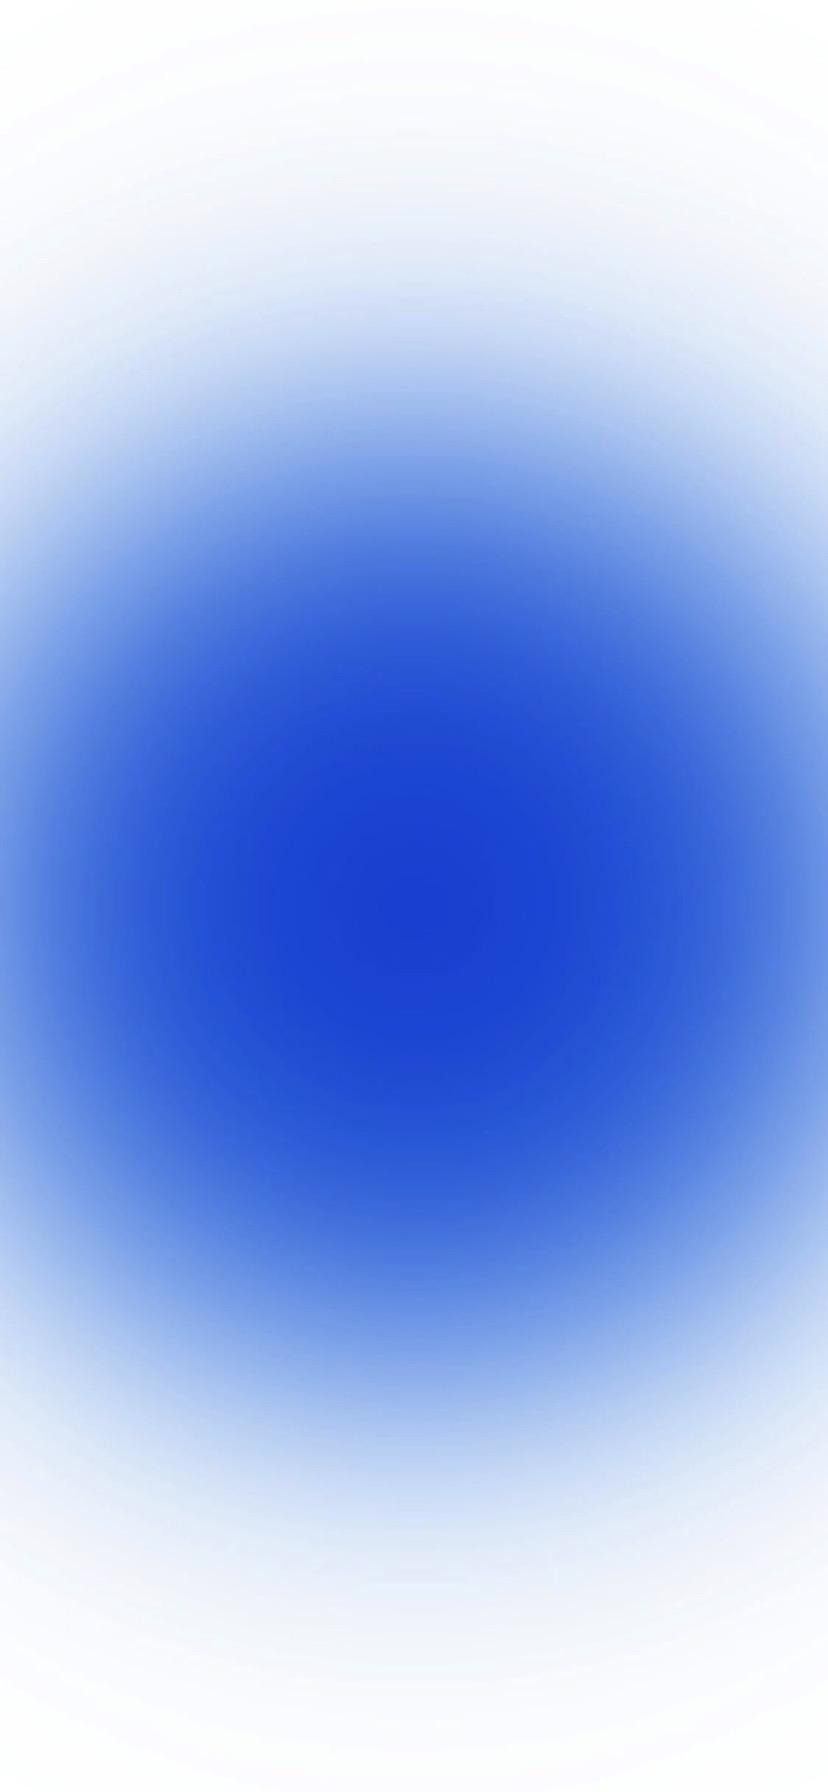 iPhone XR 壁紙 0540